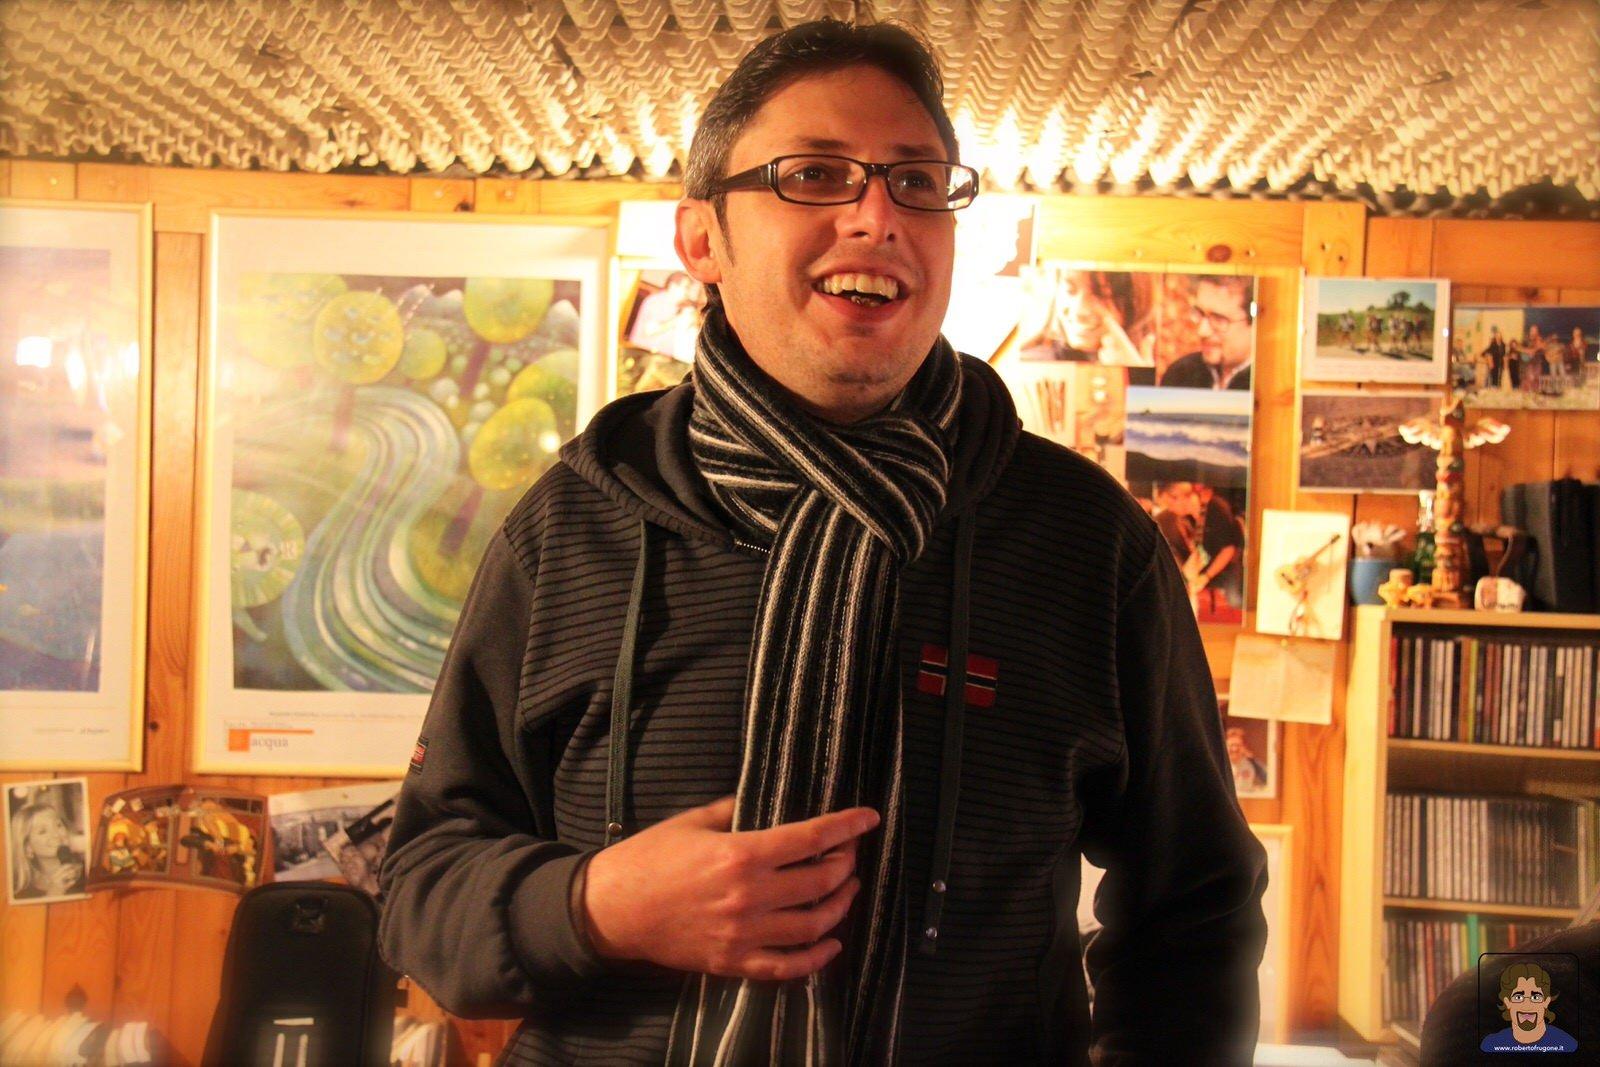 Totem Studio Sala Prove Musicali Casarza Ligure Gianteo Bordero